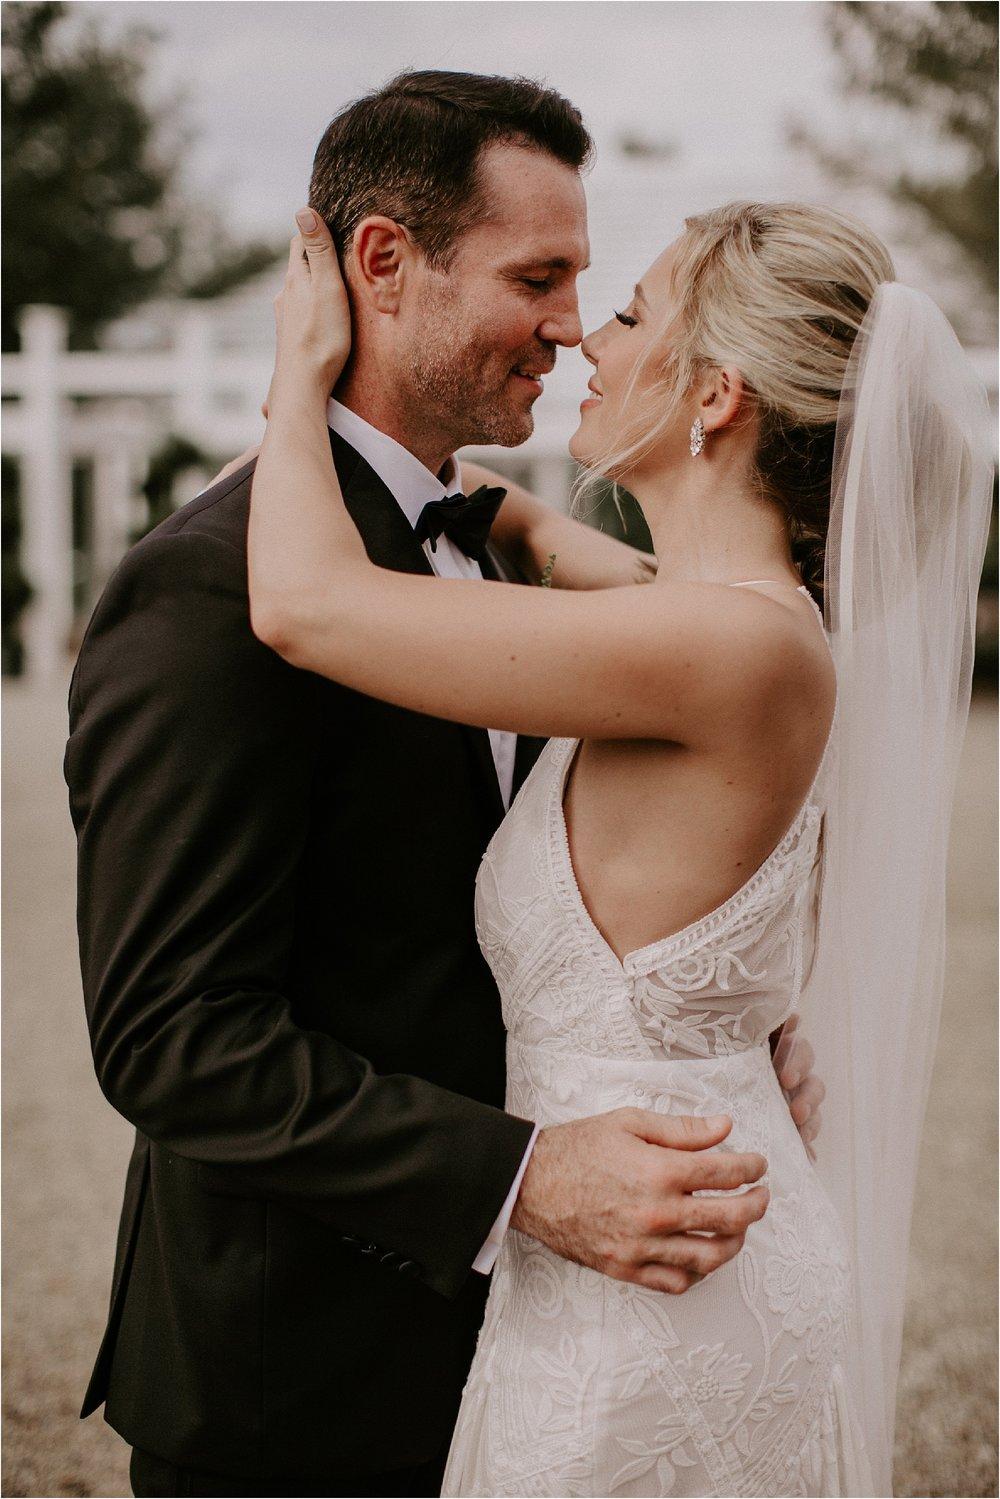 Sarah_Brookhart_Hortulus_Farm_Garden_and_Nursey_Wedding_Photographer_0052.jpg